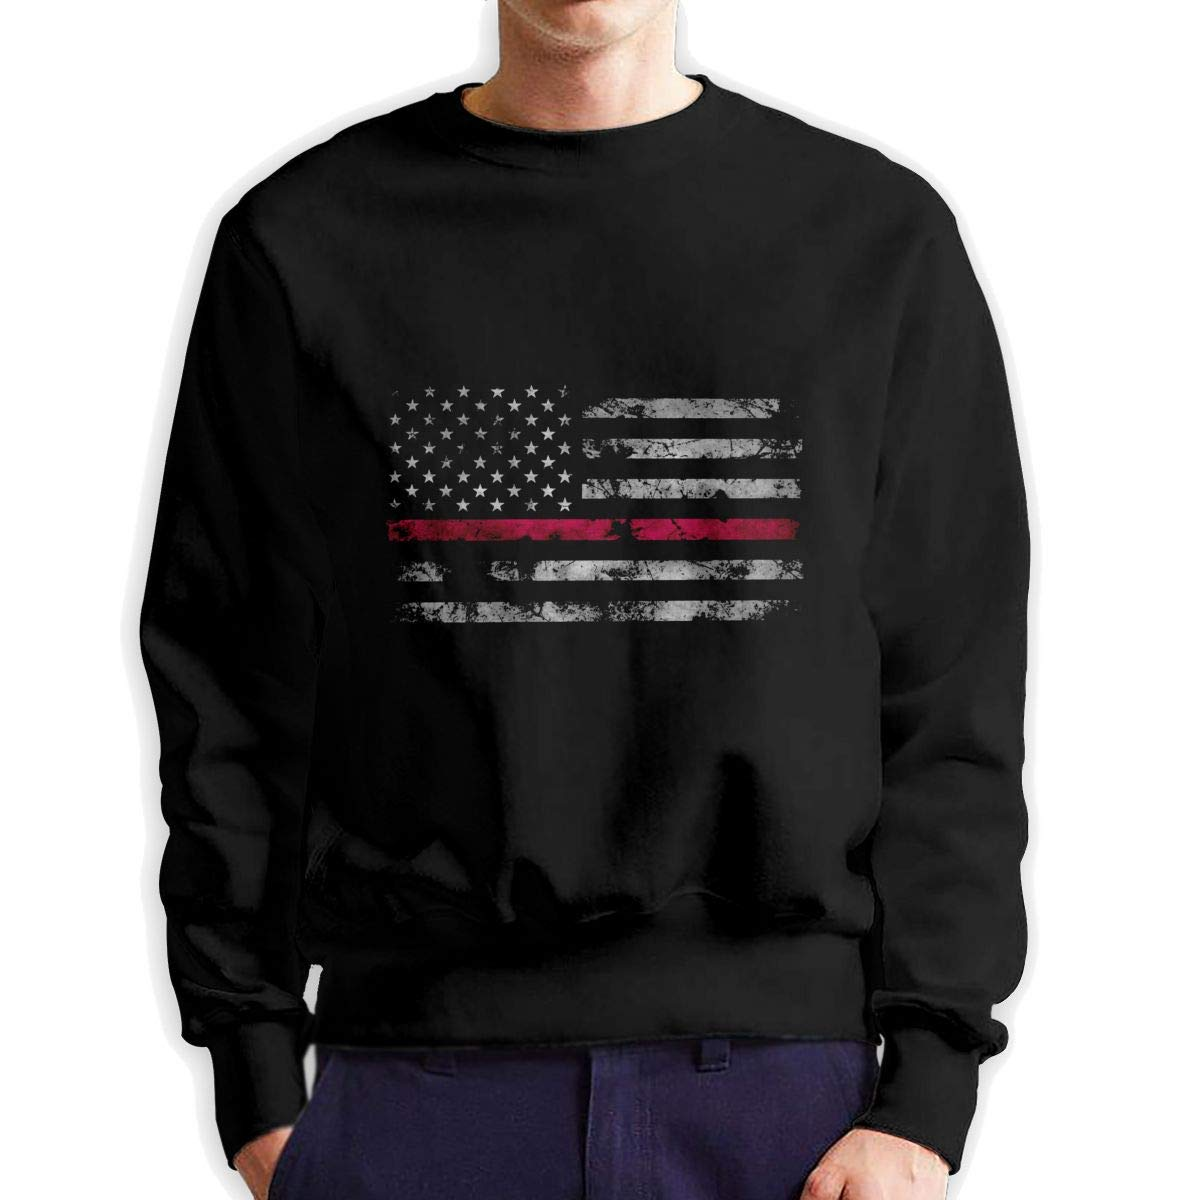 RUANJB Mens Retro America Flag Long Sleeve Crewneck Sweatshirt